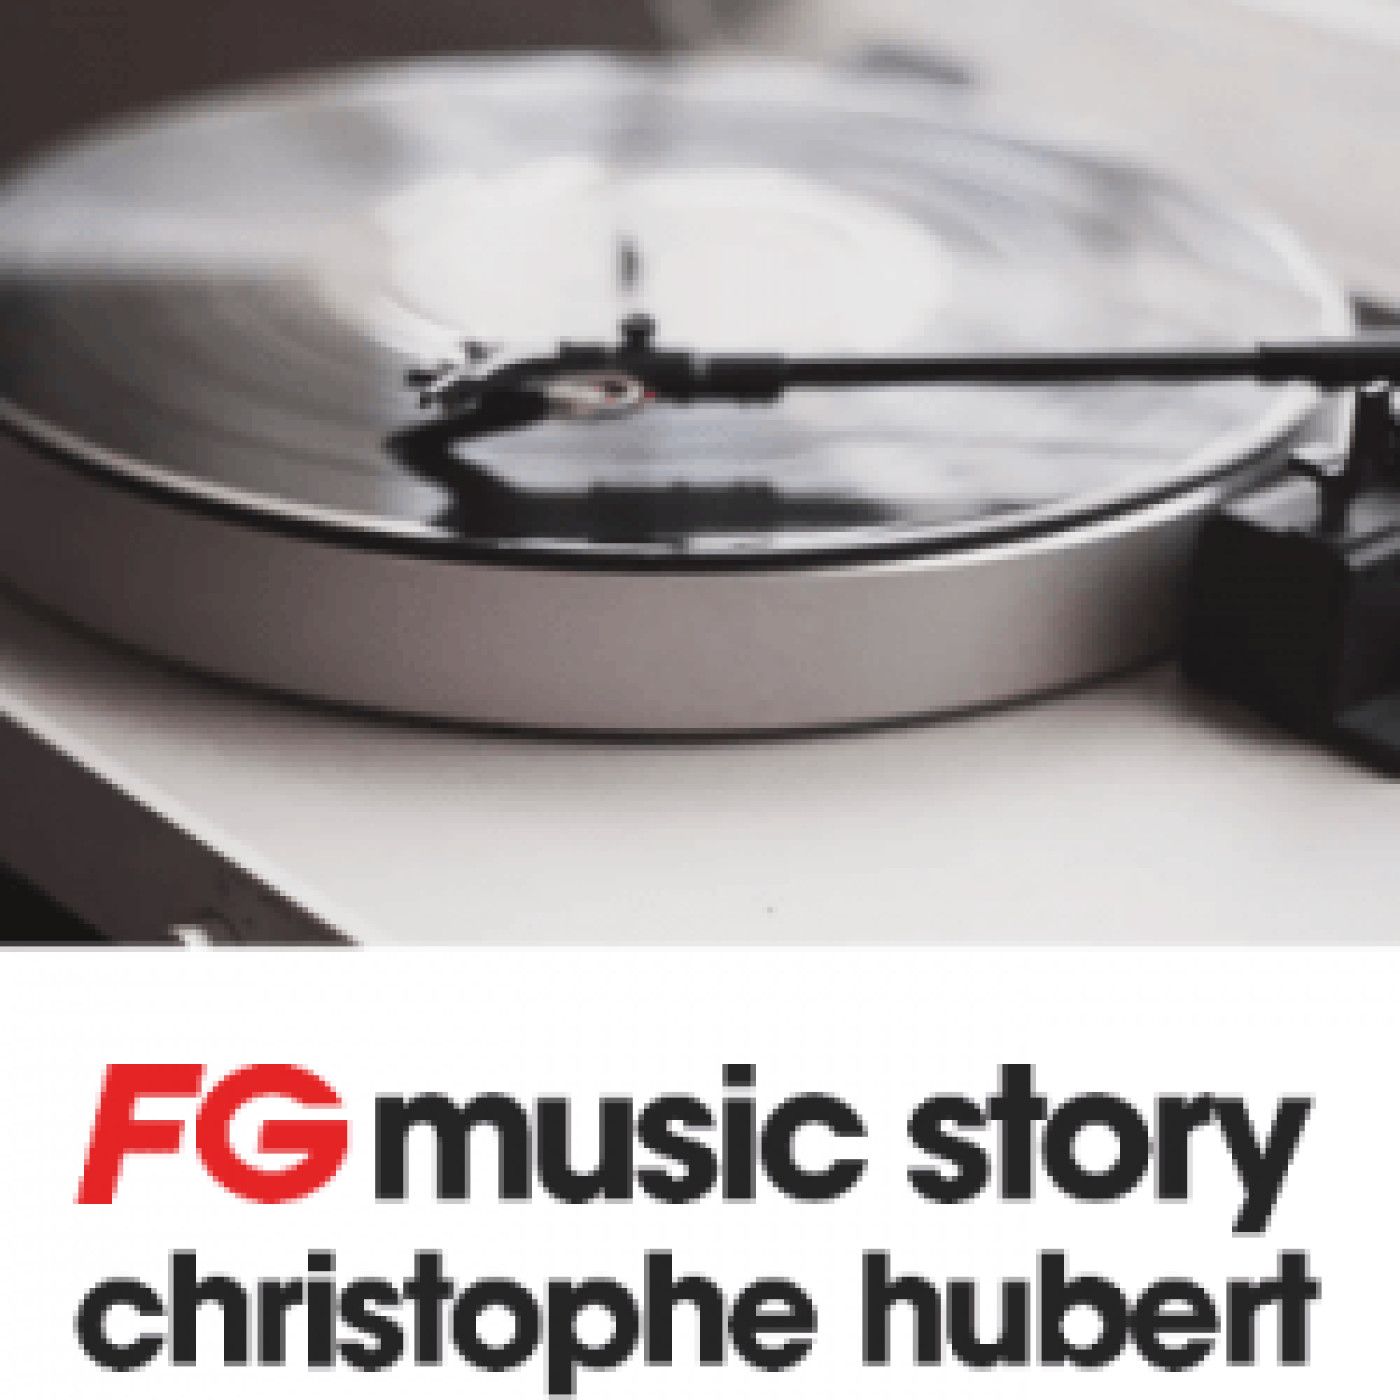 FG MUSIC STORY : FABRIC